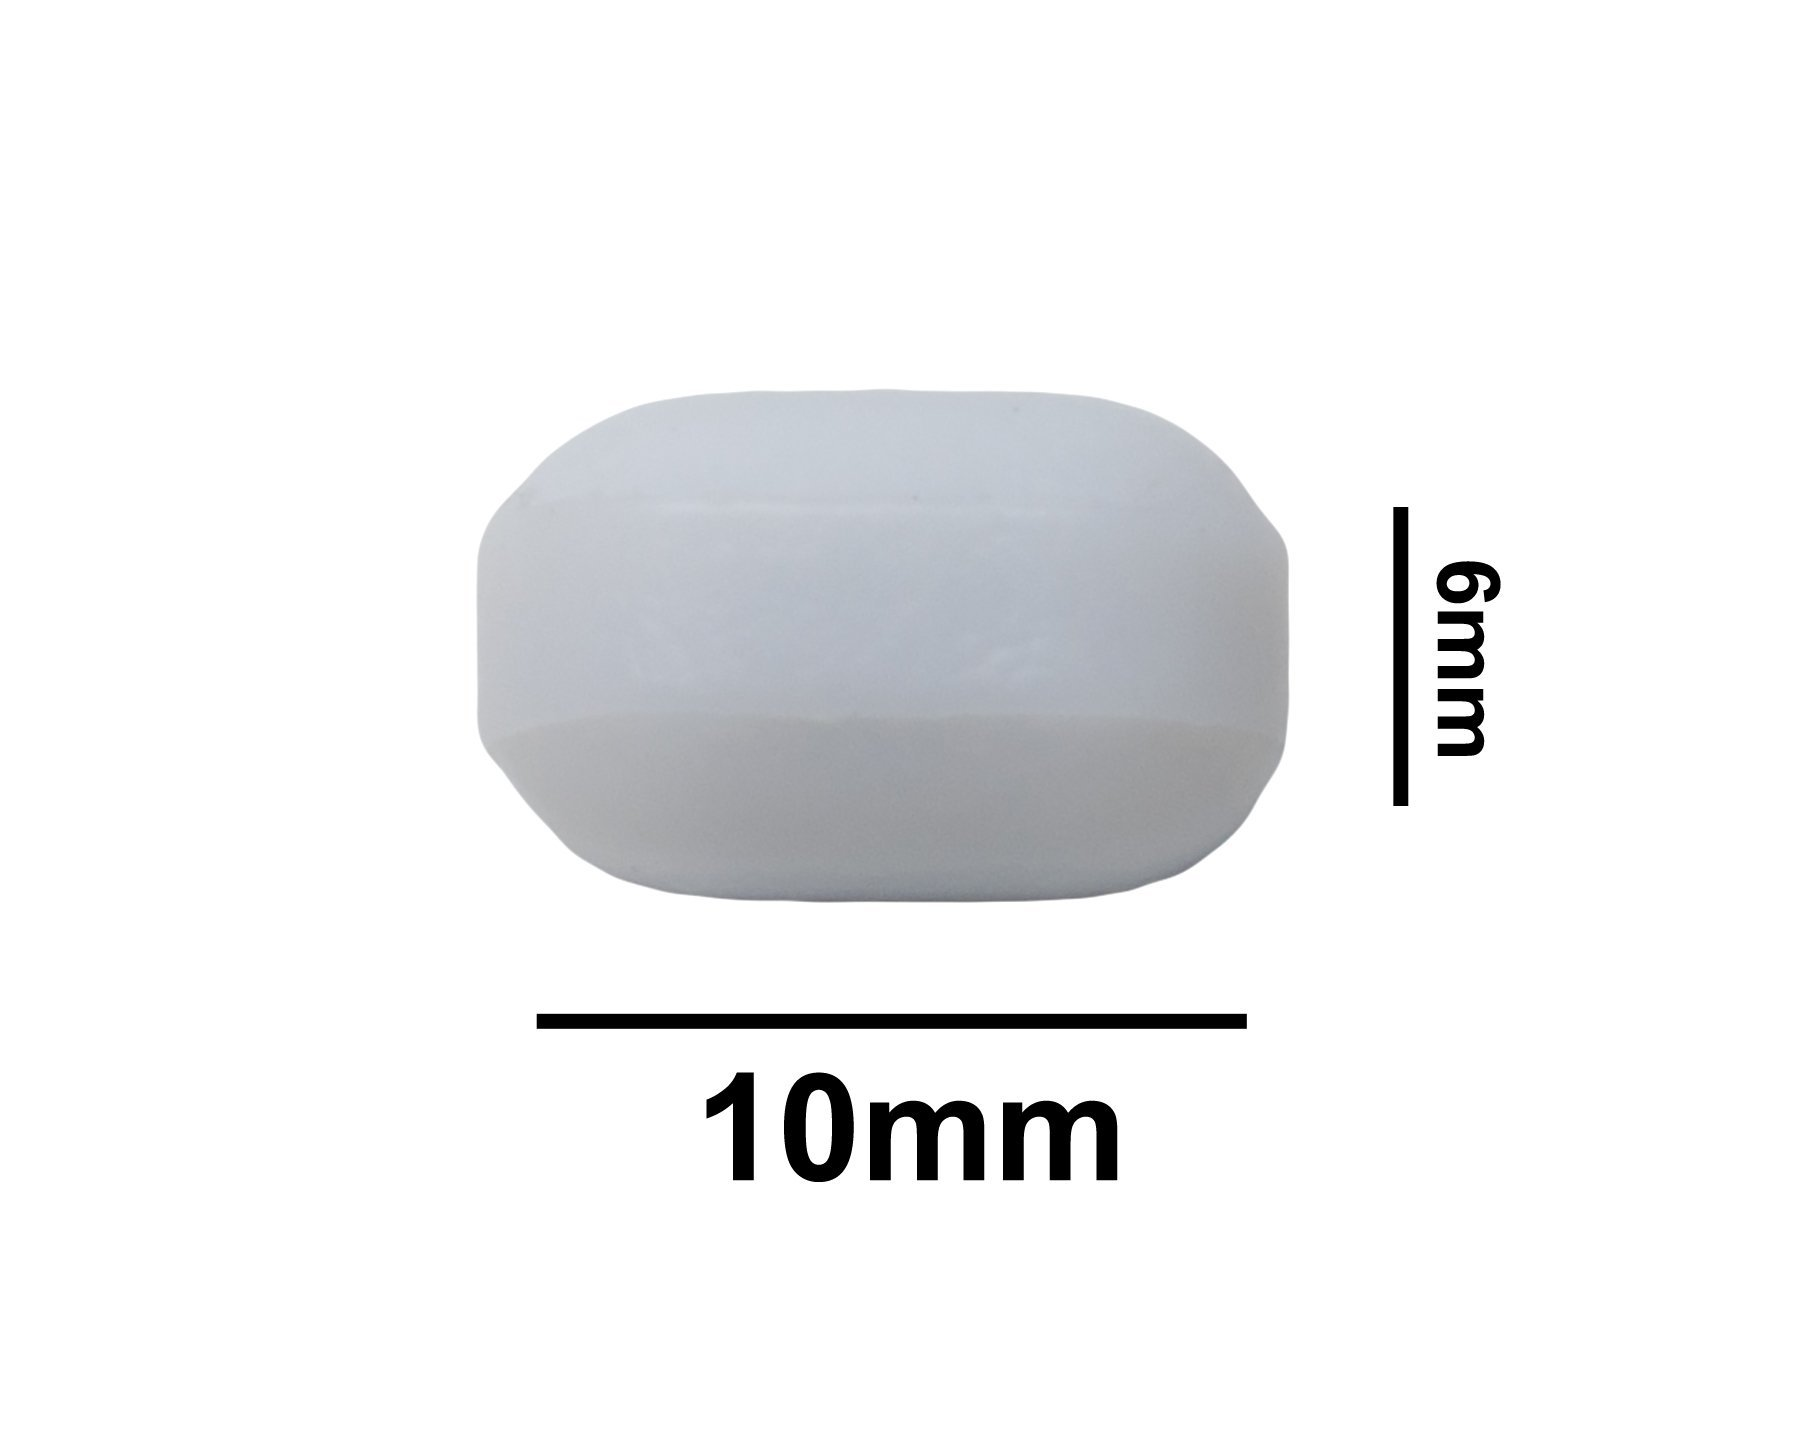 Bel-Art Spinbar Teflon Polygon Magnetic Stirring Bar; 10 x 6mm, White, Without Pivot Ring (F37120-0010)